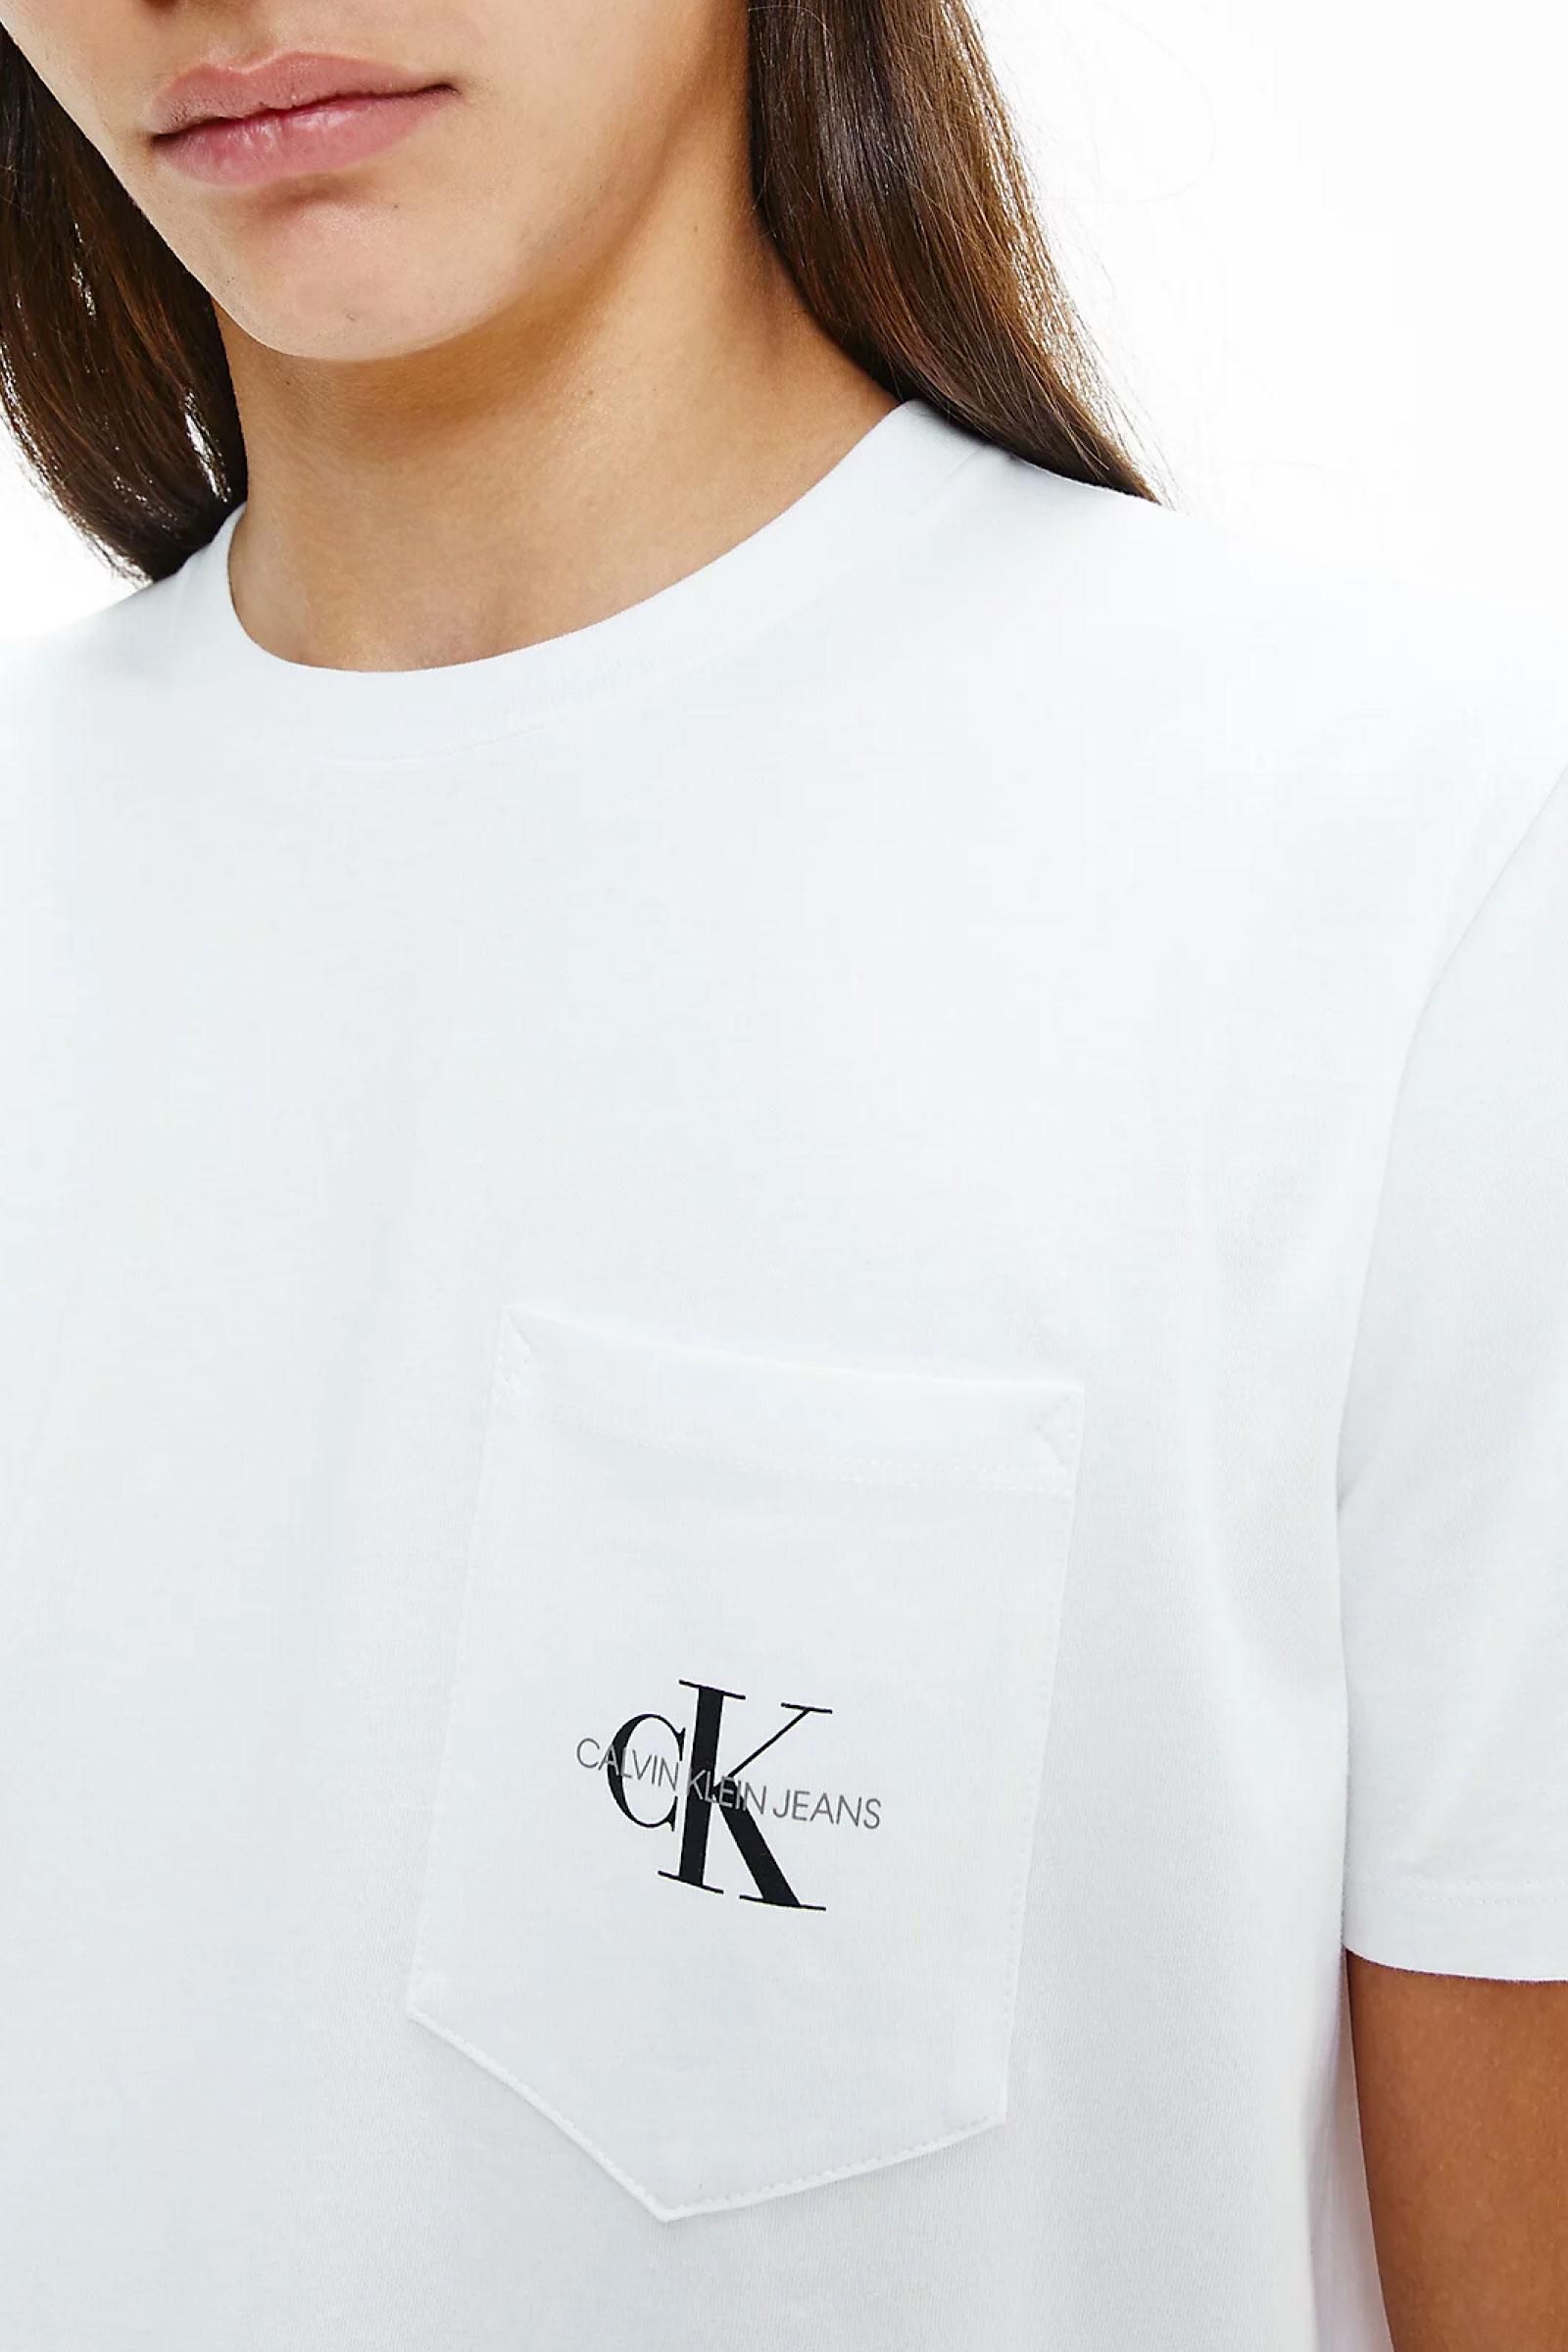 CALVIN KLEIN JEANS   T-Shirt   J30J317294YAF